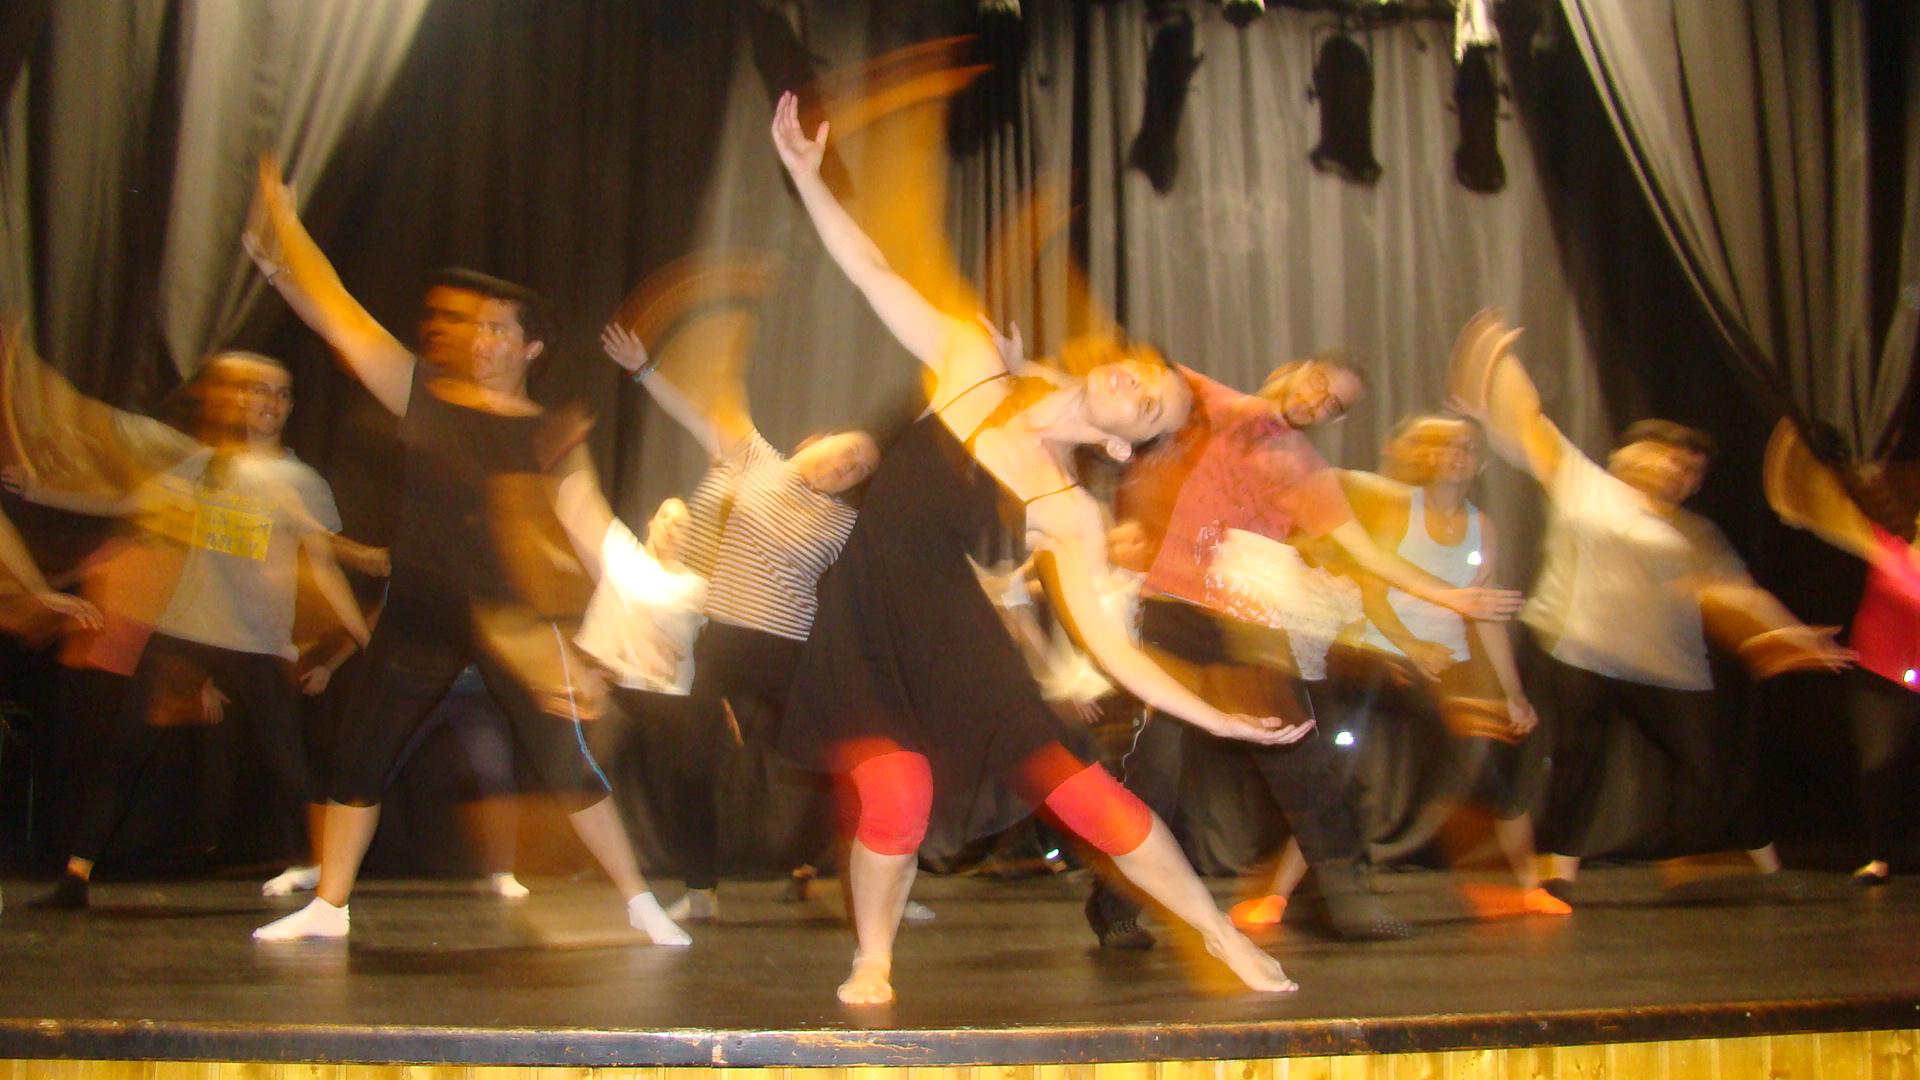 Taller de Danza en Movimiento